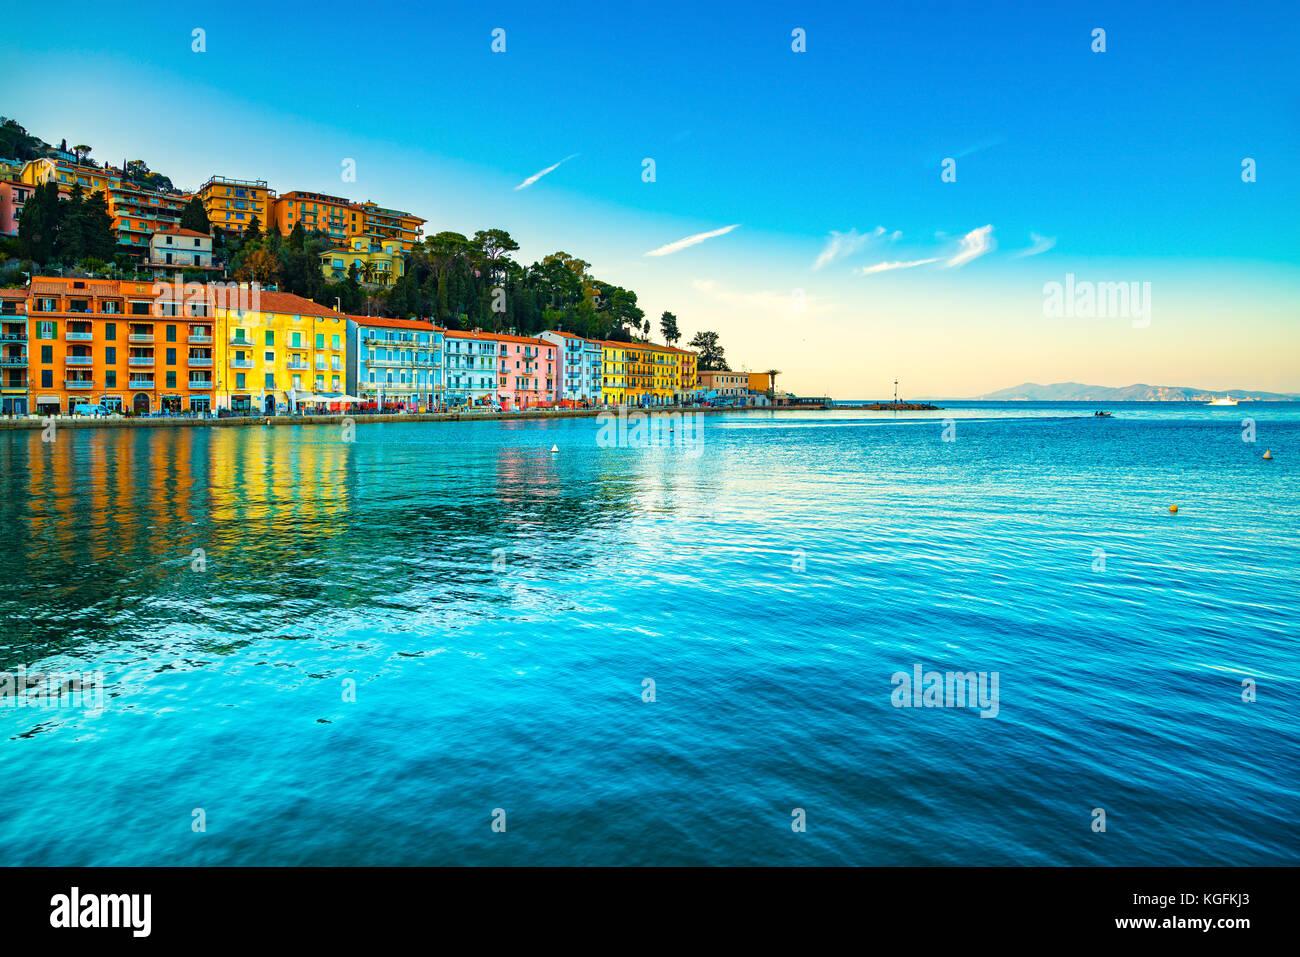 Porto Santo Stefano seafront, italian travel destination. Monte Argentario, Tuscany, Italy. Long exposure. - Stock Image